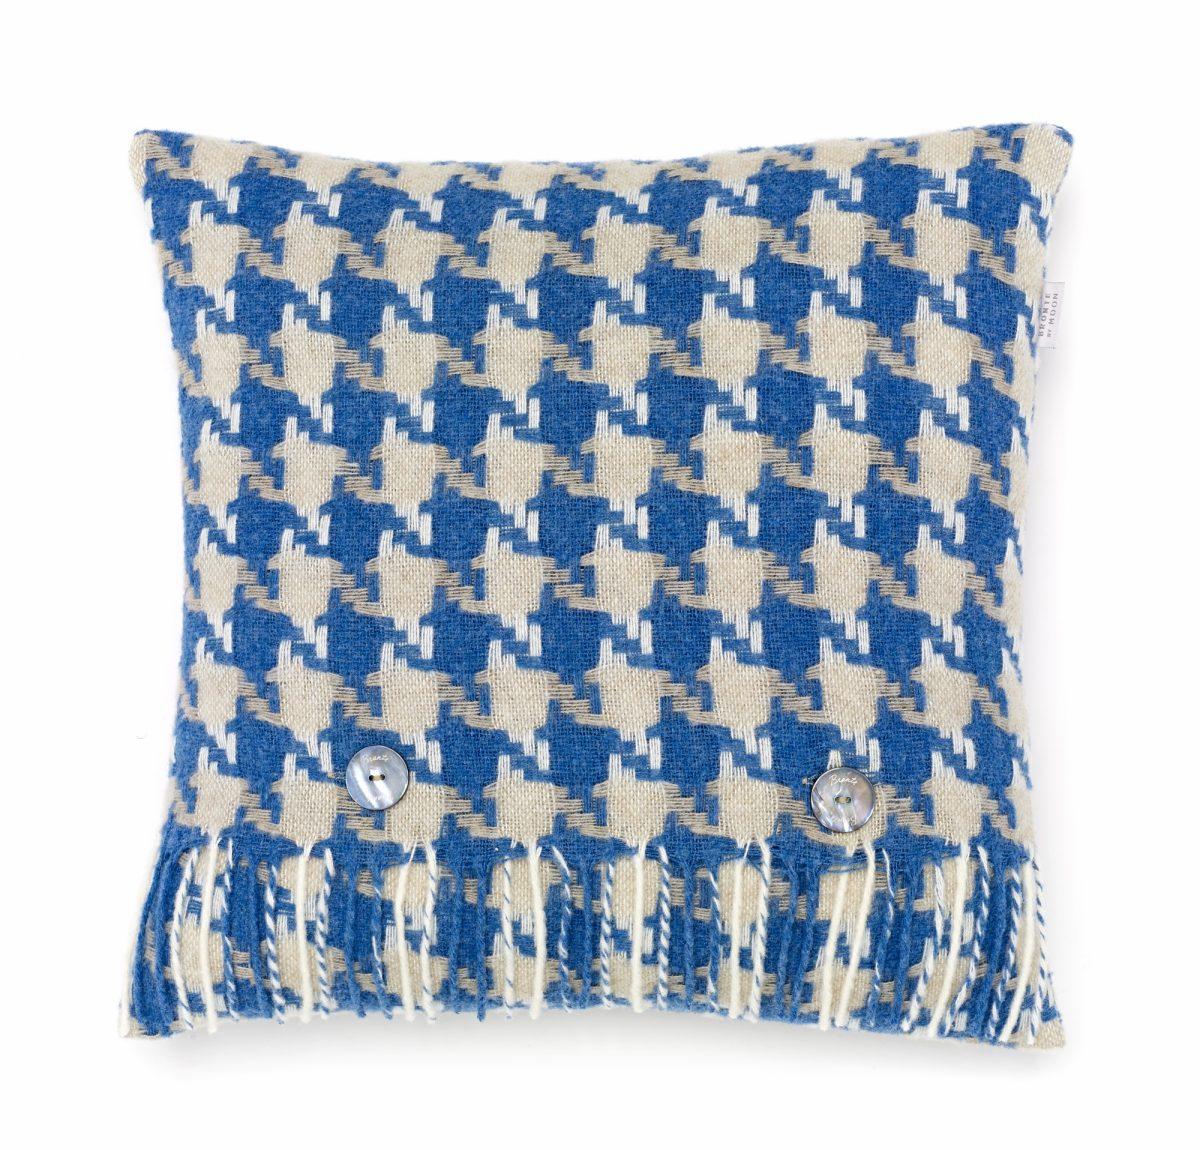 T0429 M07 LC Lambswool Houndstooth Aqua Cushion